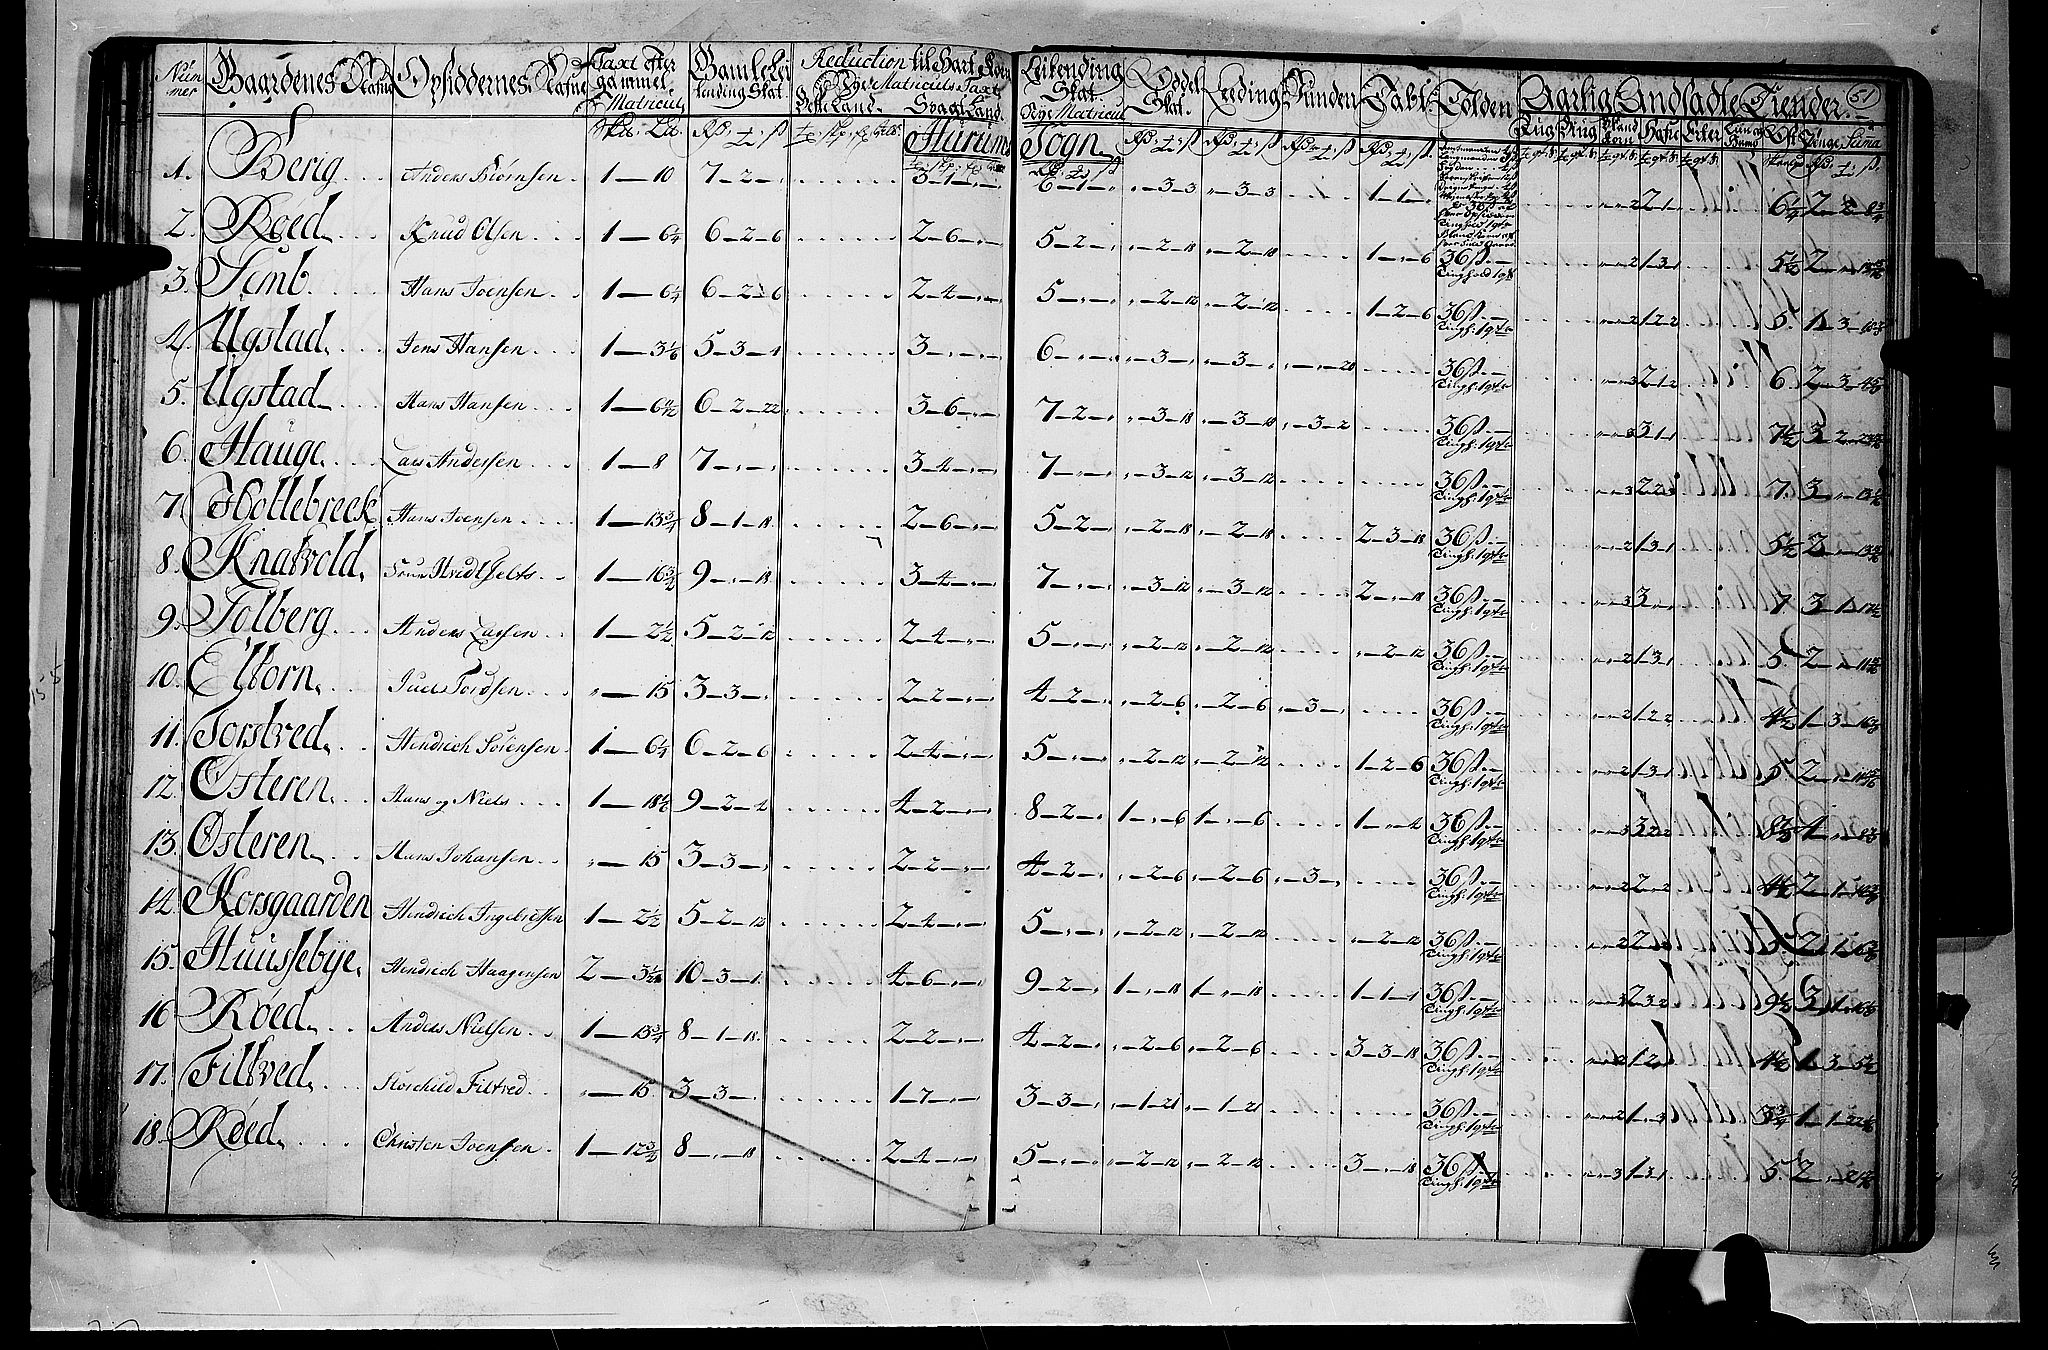 RA, Rentekammeret inntil 1814, Realistisk ordnet avdeling, N/Nb/Nbf/L0112: Buskerud matrikkelprotokoll, 1723, s. 50b-51a